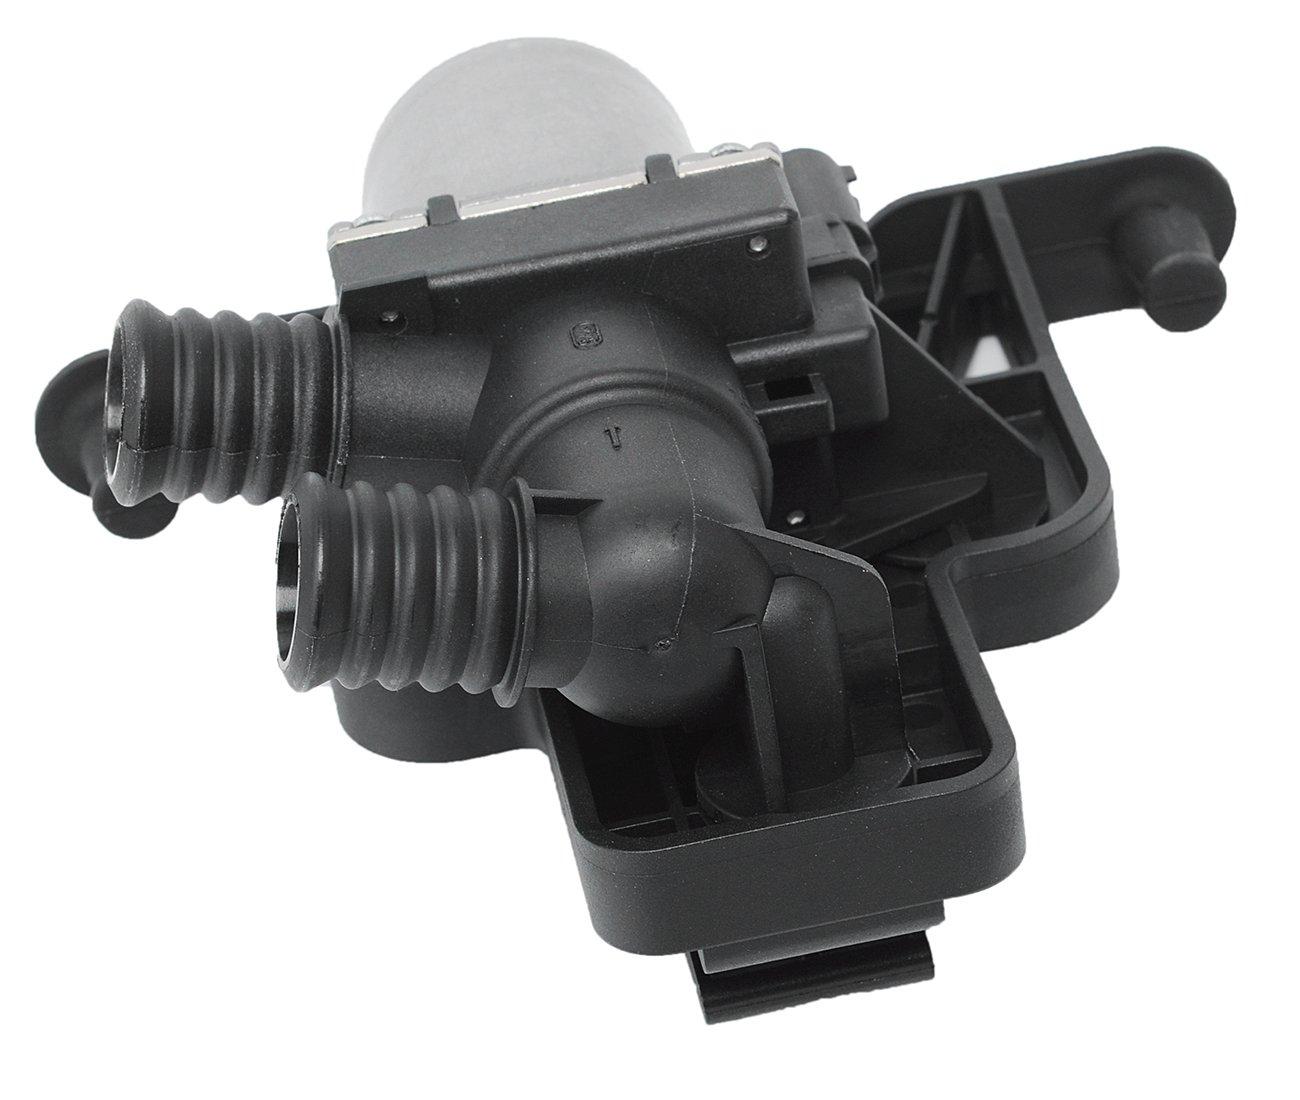 Topaz 64118379921 Heater Control Valve For Bmw E60 E61 2002 Audi A4 Core X5 E53 Automotive